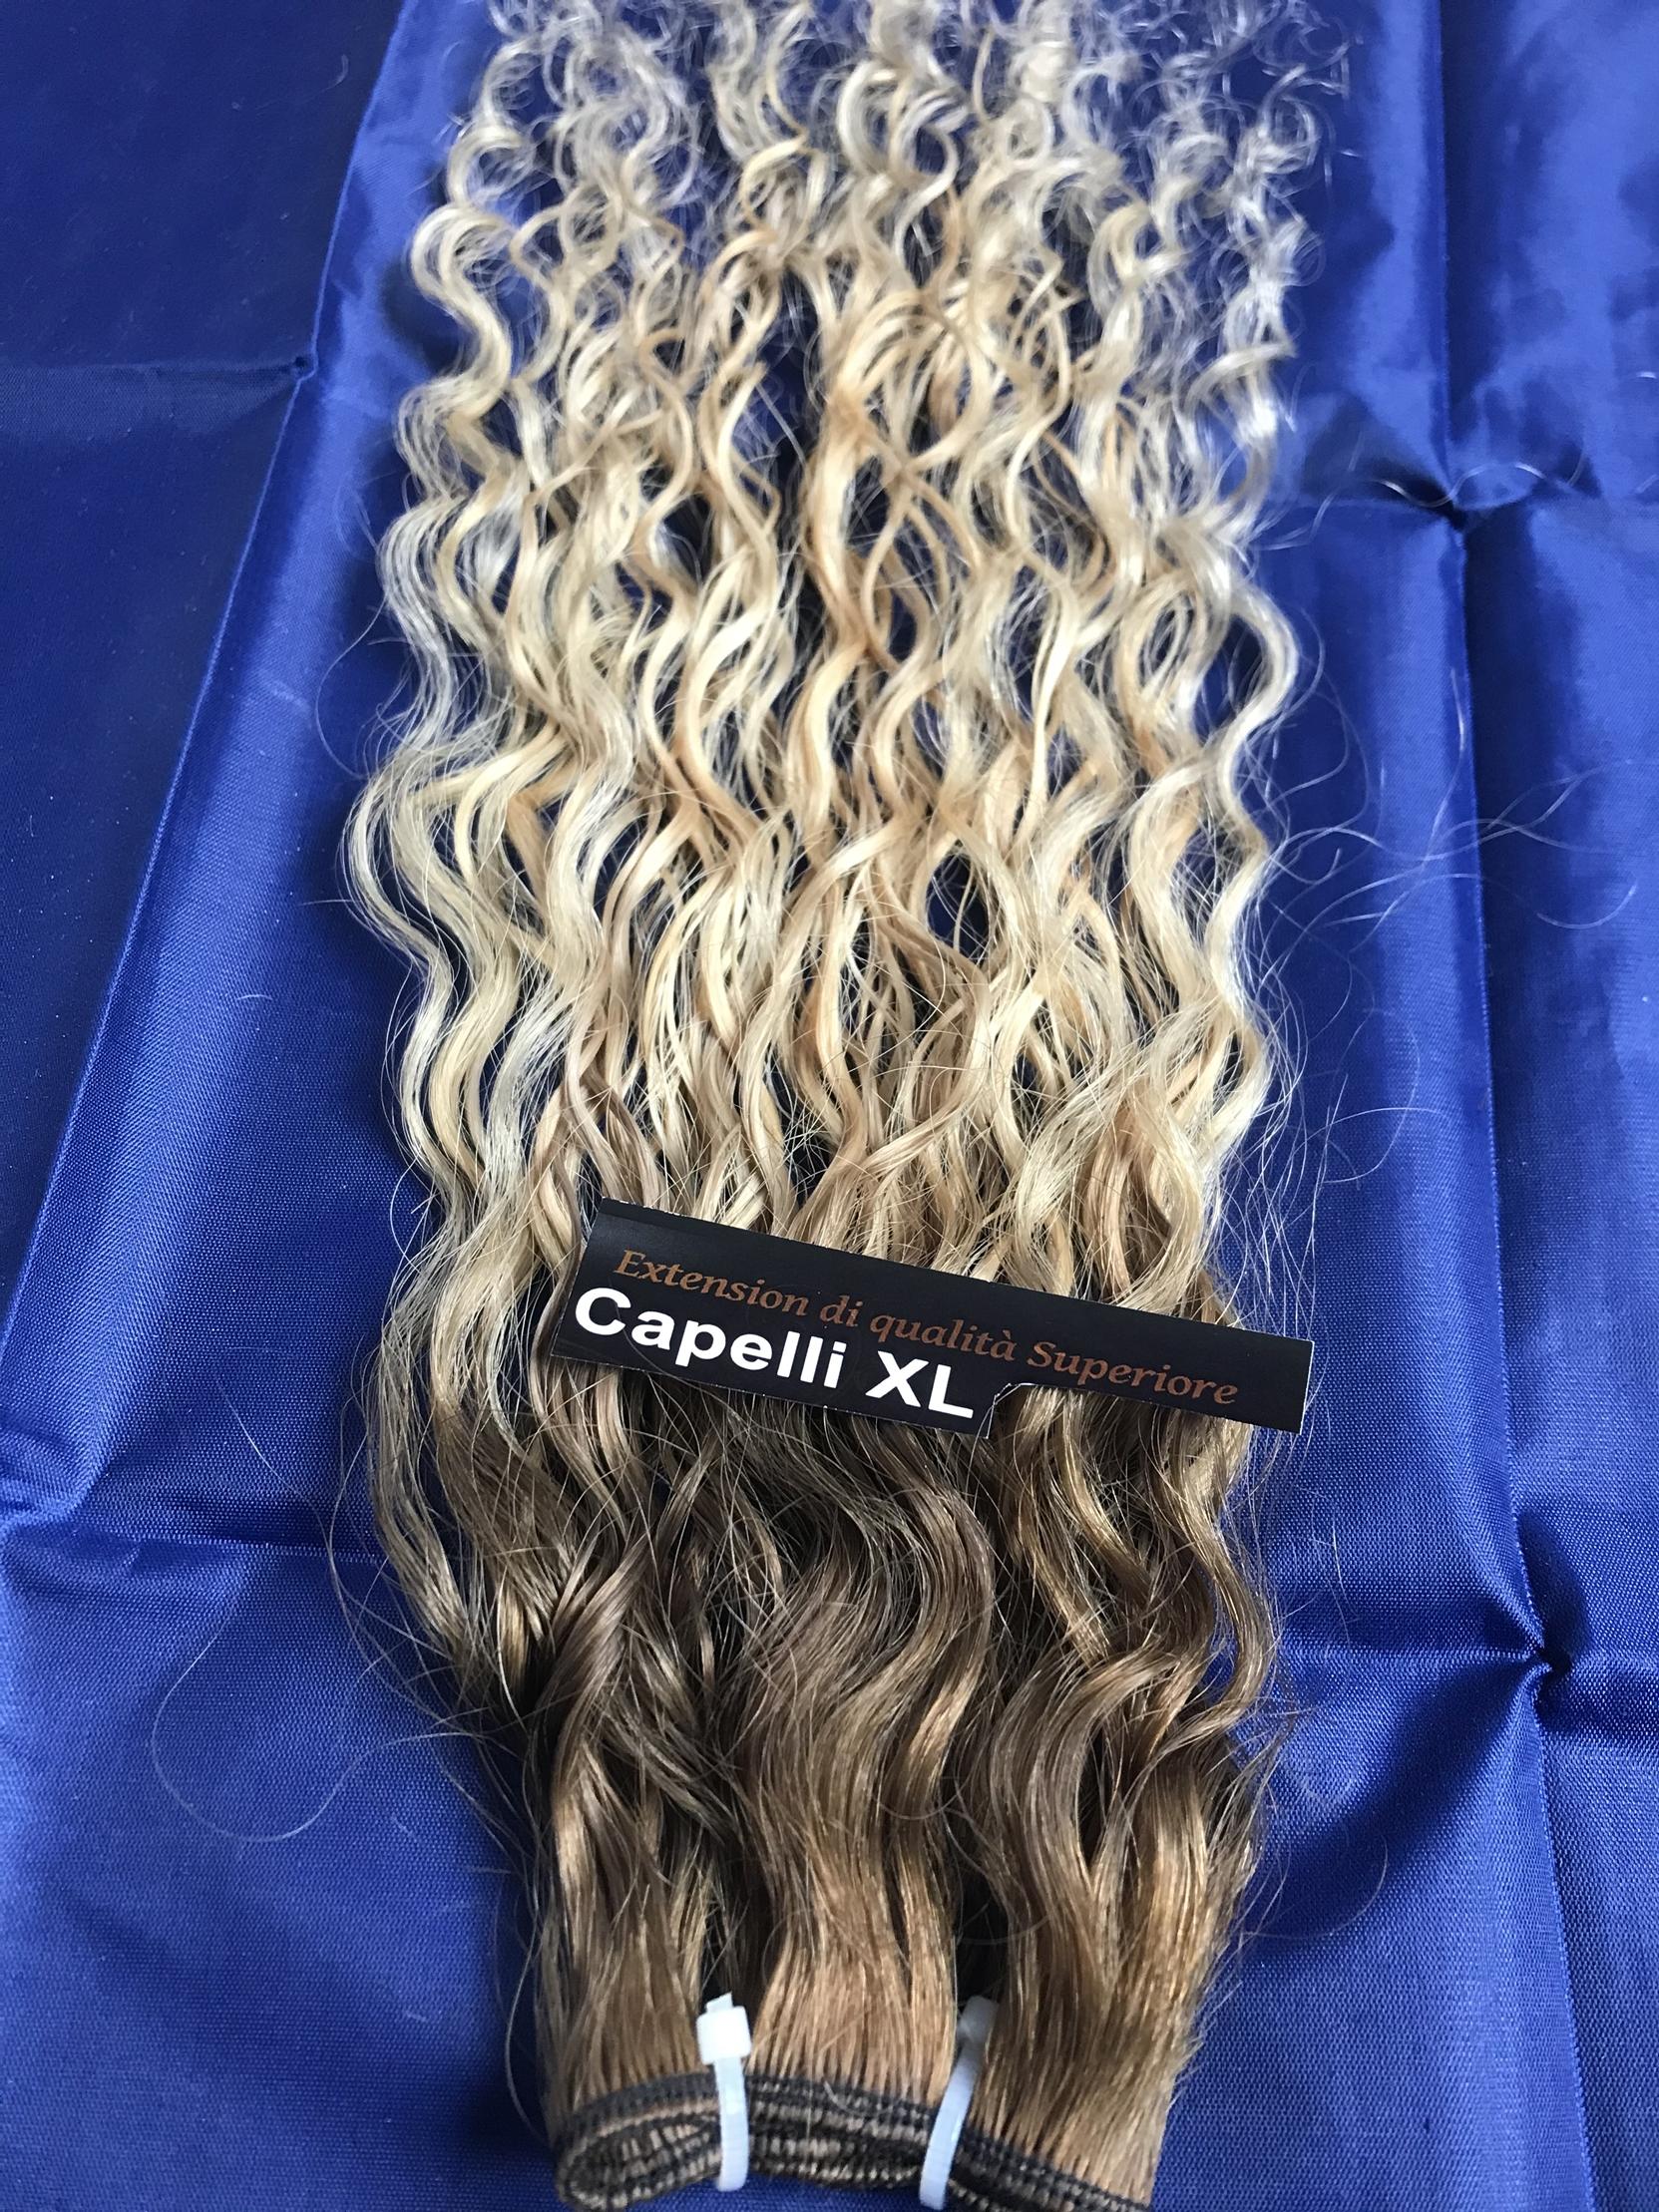 Capelli veri remy Balayage capelli ricci  sfumati Shatush